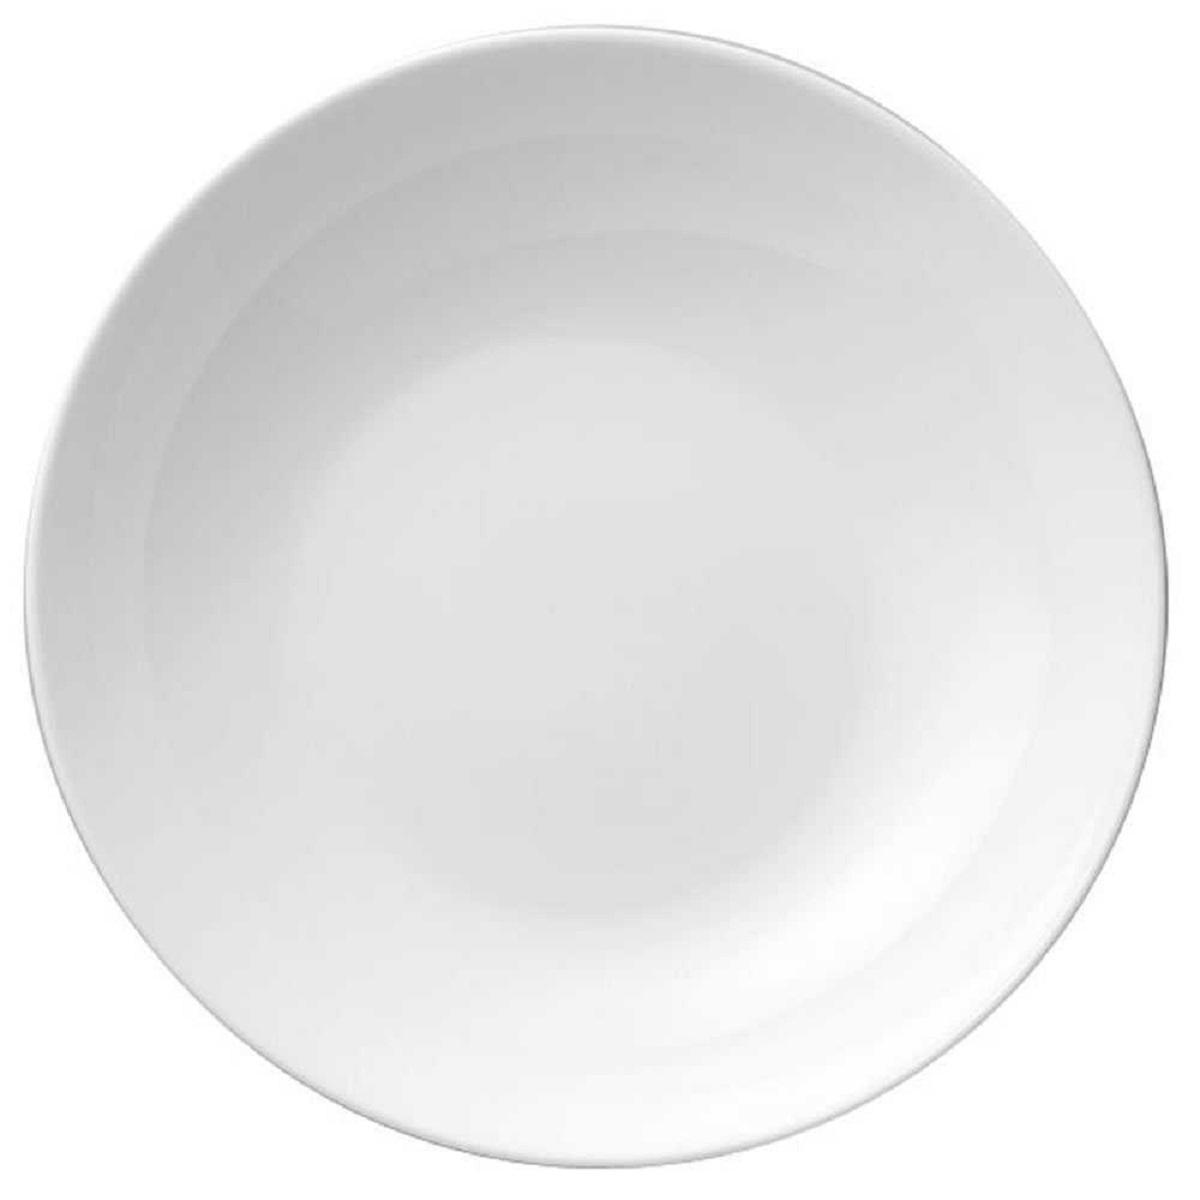 Тарелка глубокая фарфоровая Rosenthal JADE, диаметр 19 см, белый Rosenthal 61040-800001-10319 фото 0